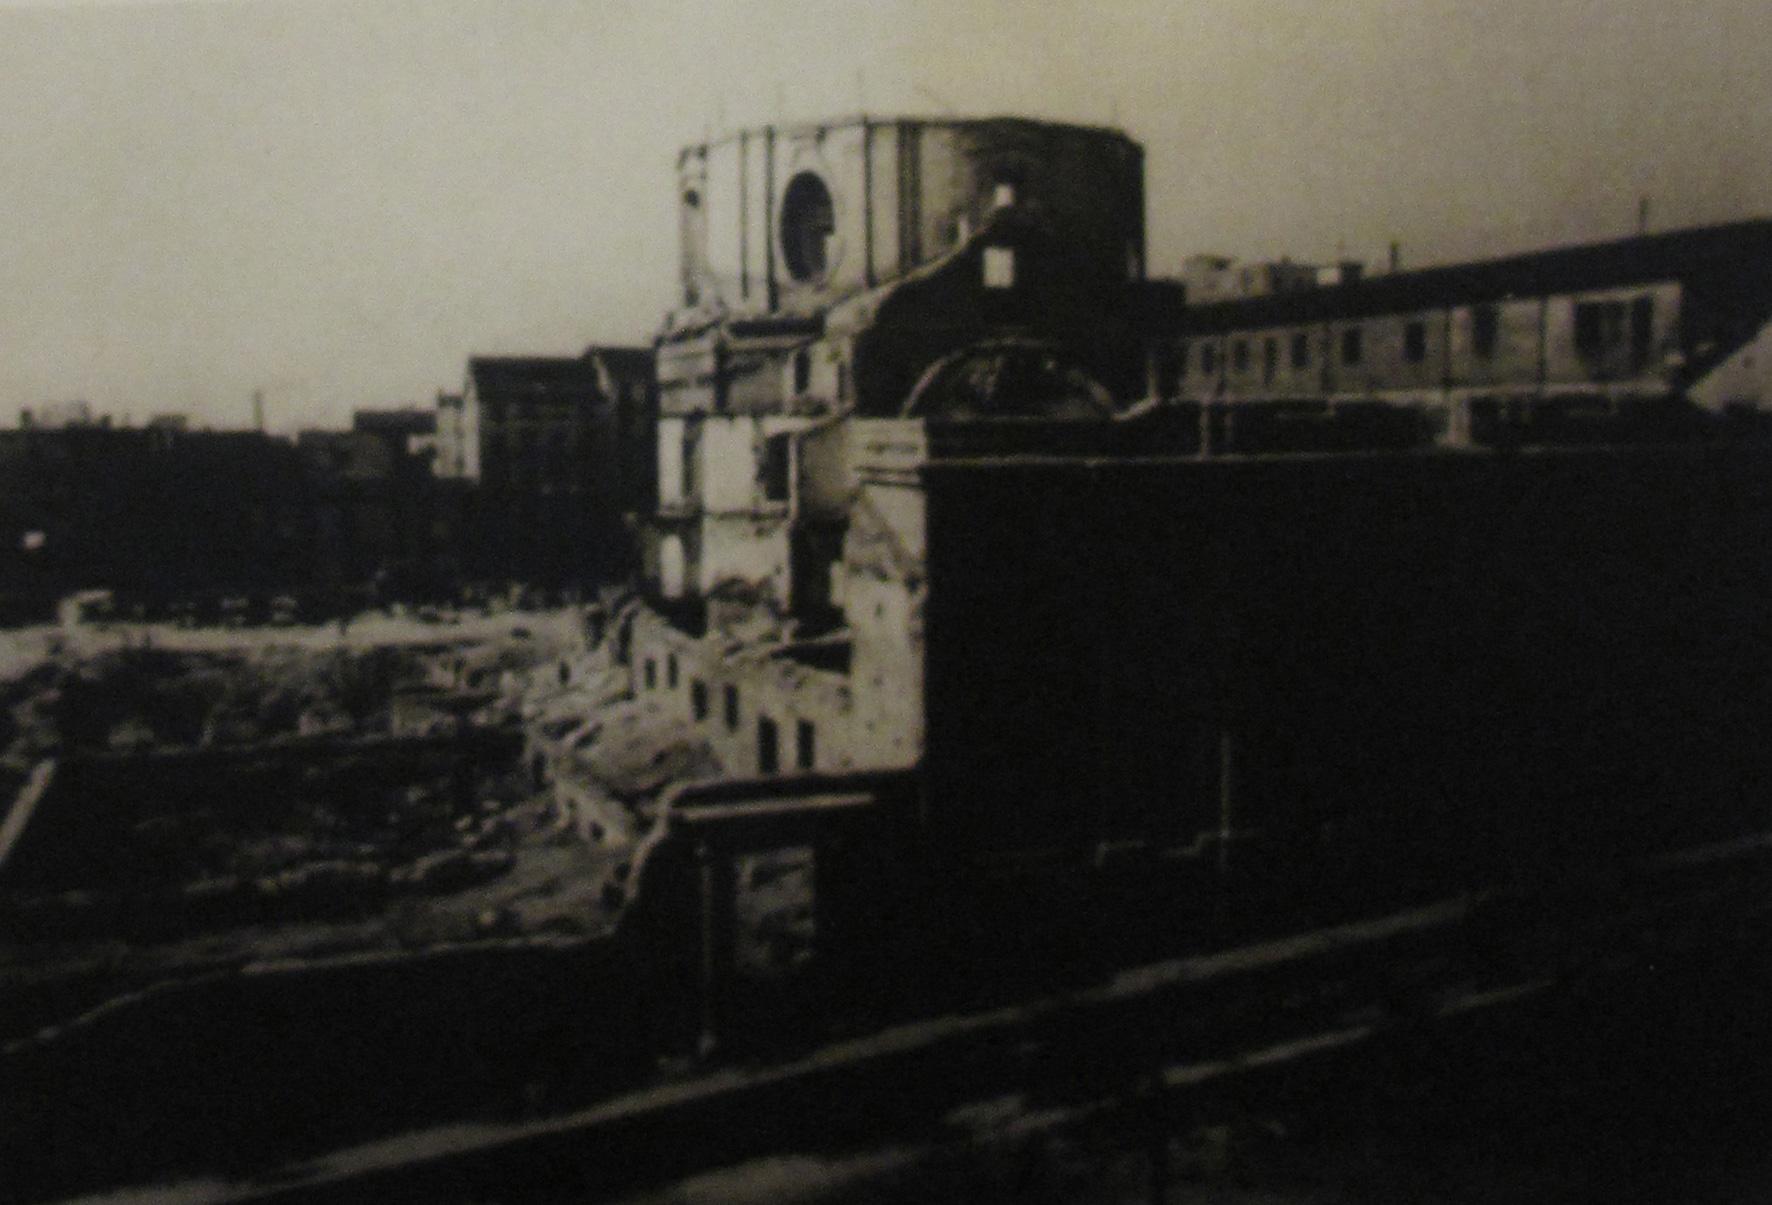 escuelas pias lavapies madrid_foto historica_fuente panel explicativo